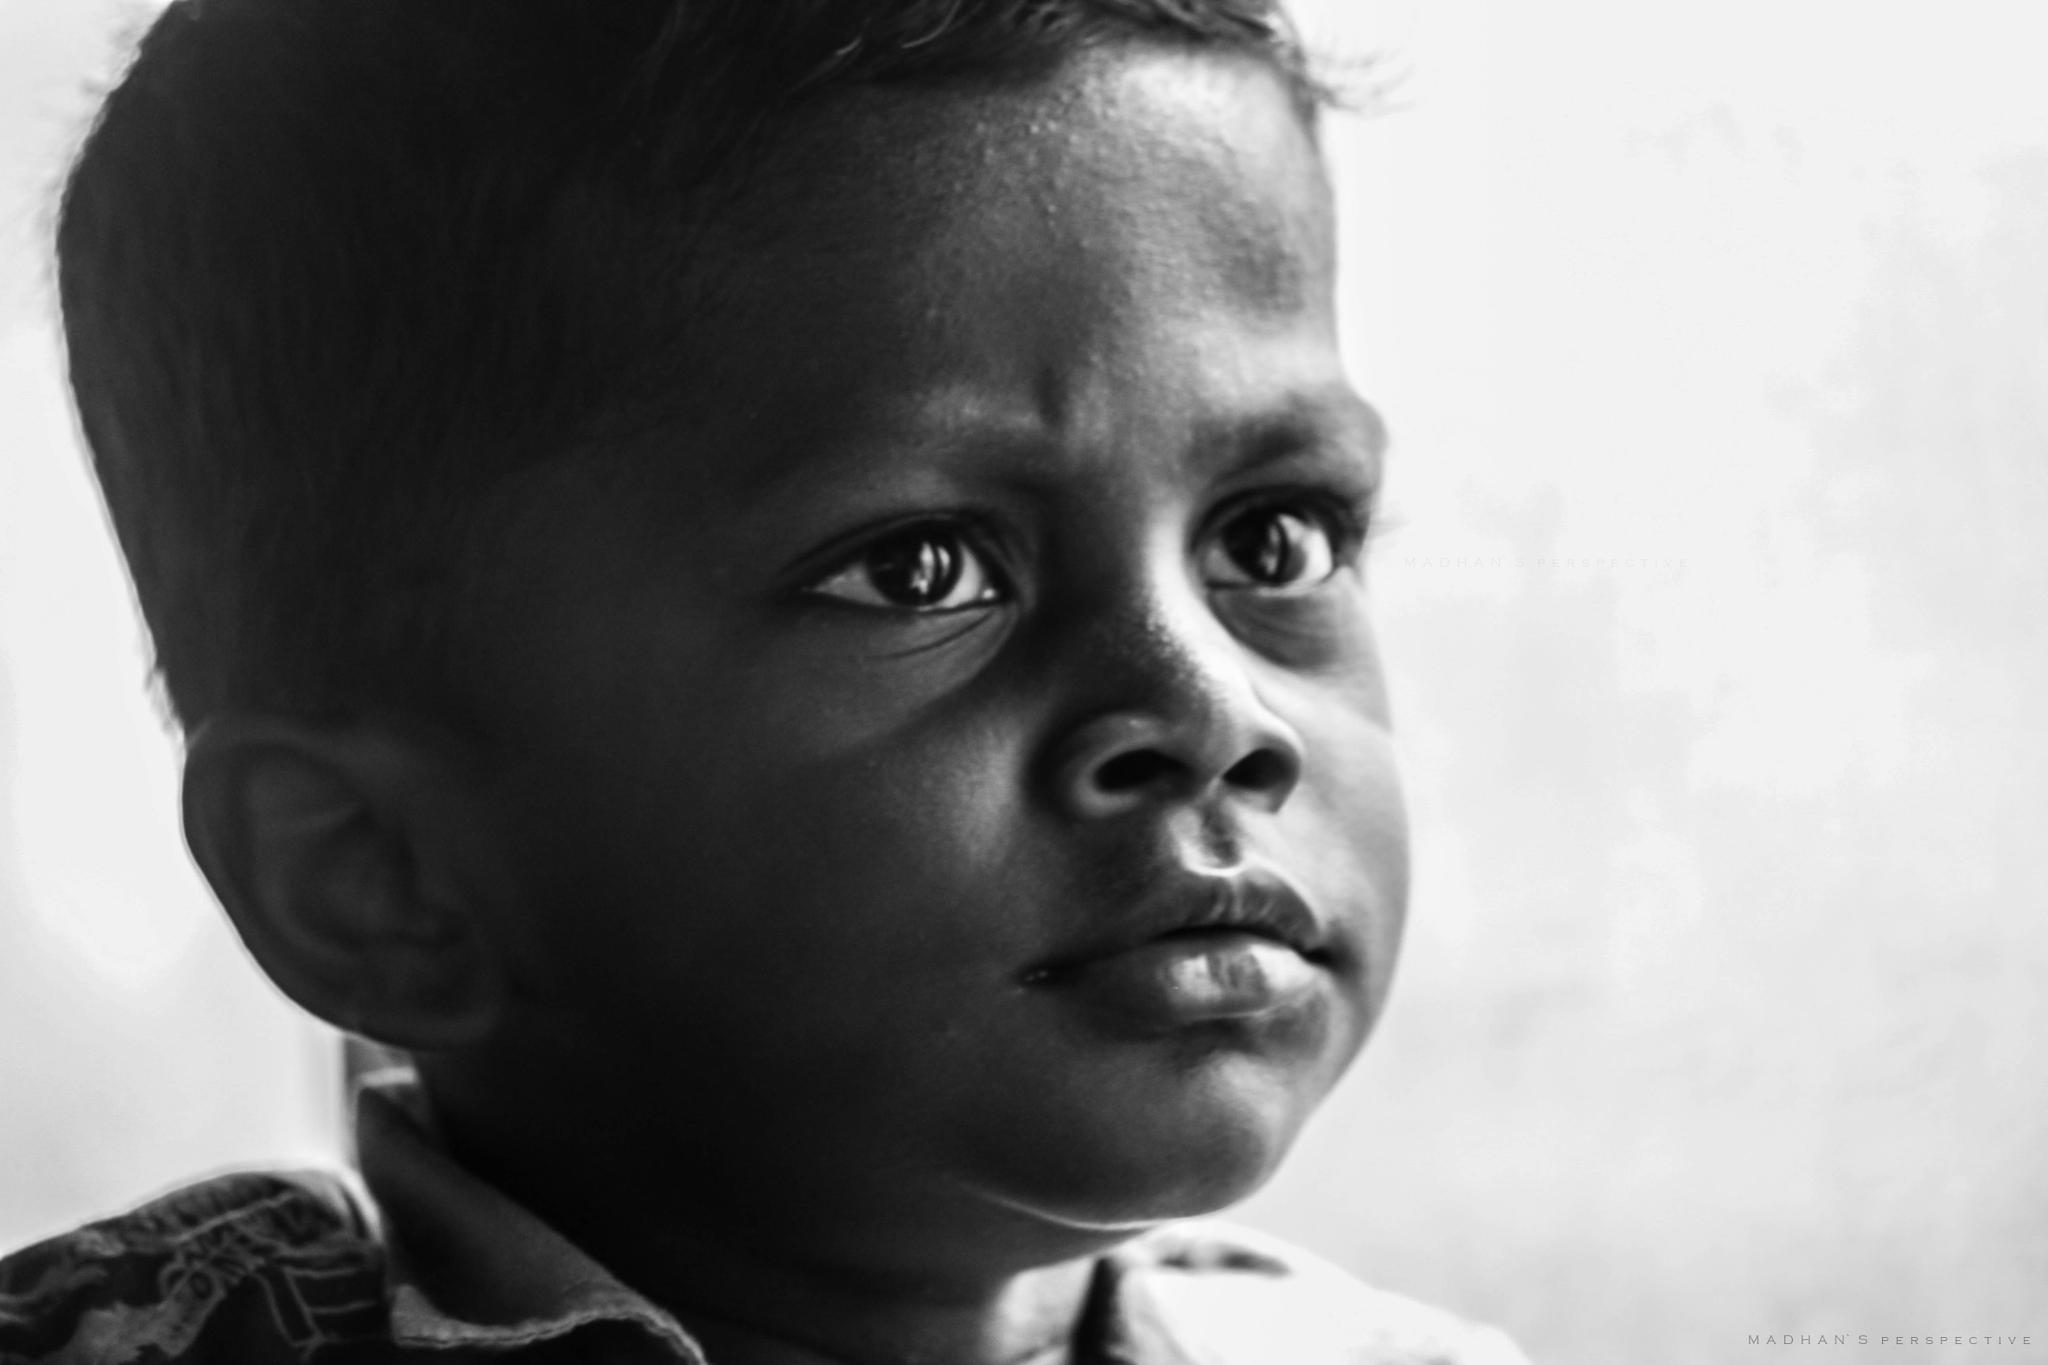 innocent child by BMadhan raj